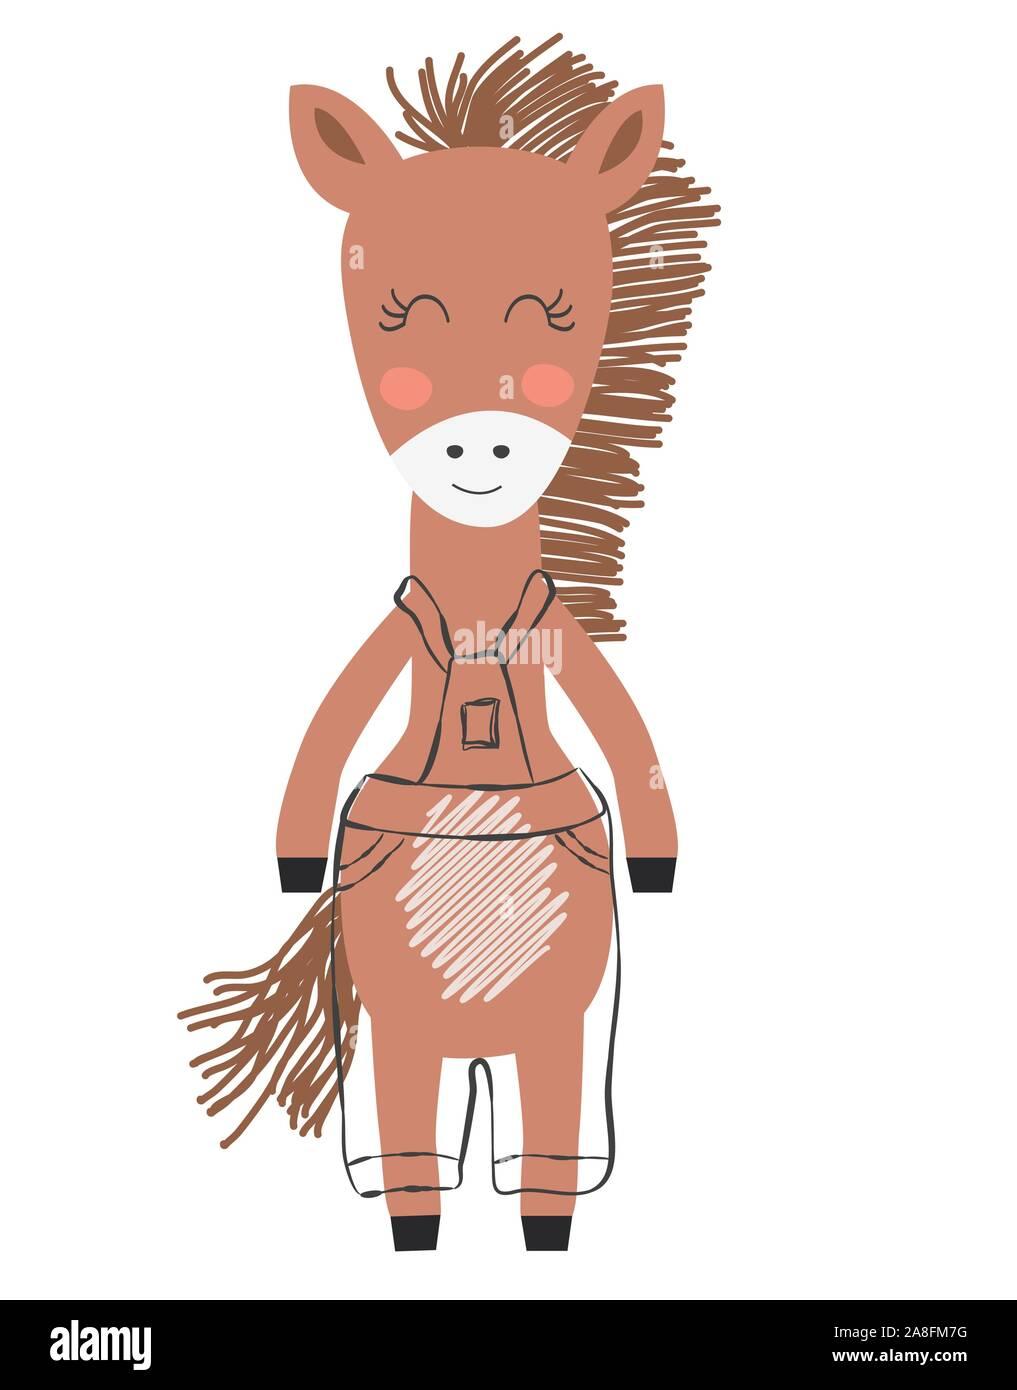 Little Cute Horse Horse Face Doodle Cartoon Kawaii Animal Illustration Scandinavian Print Or Poster Design Stock Vector Image Art Alamy